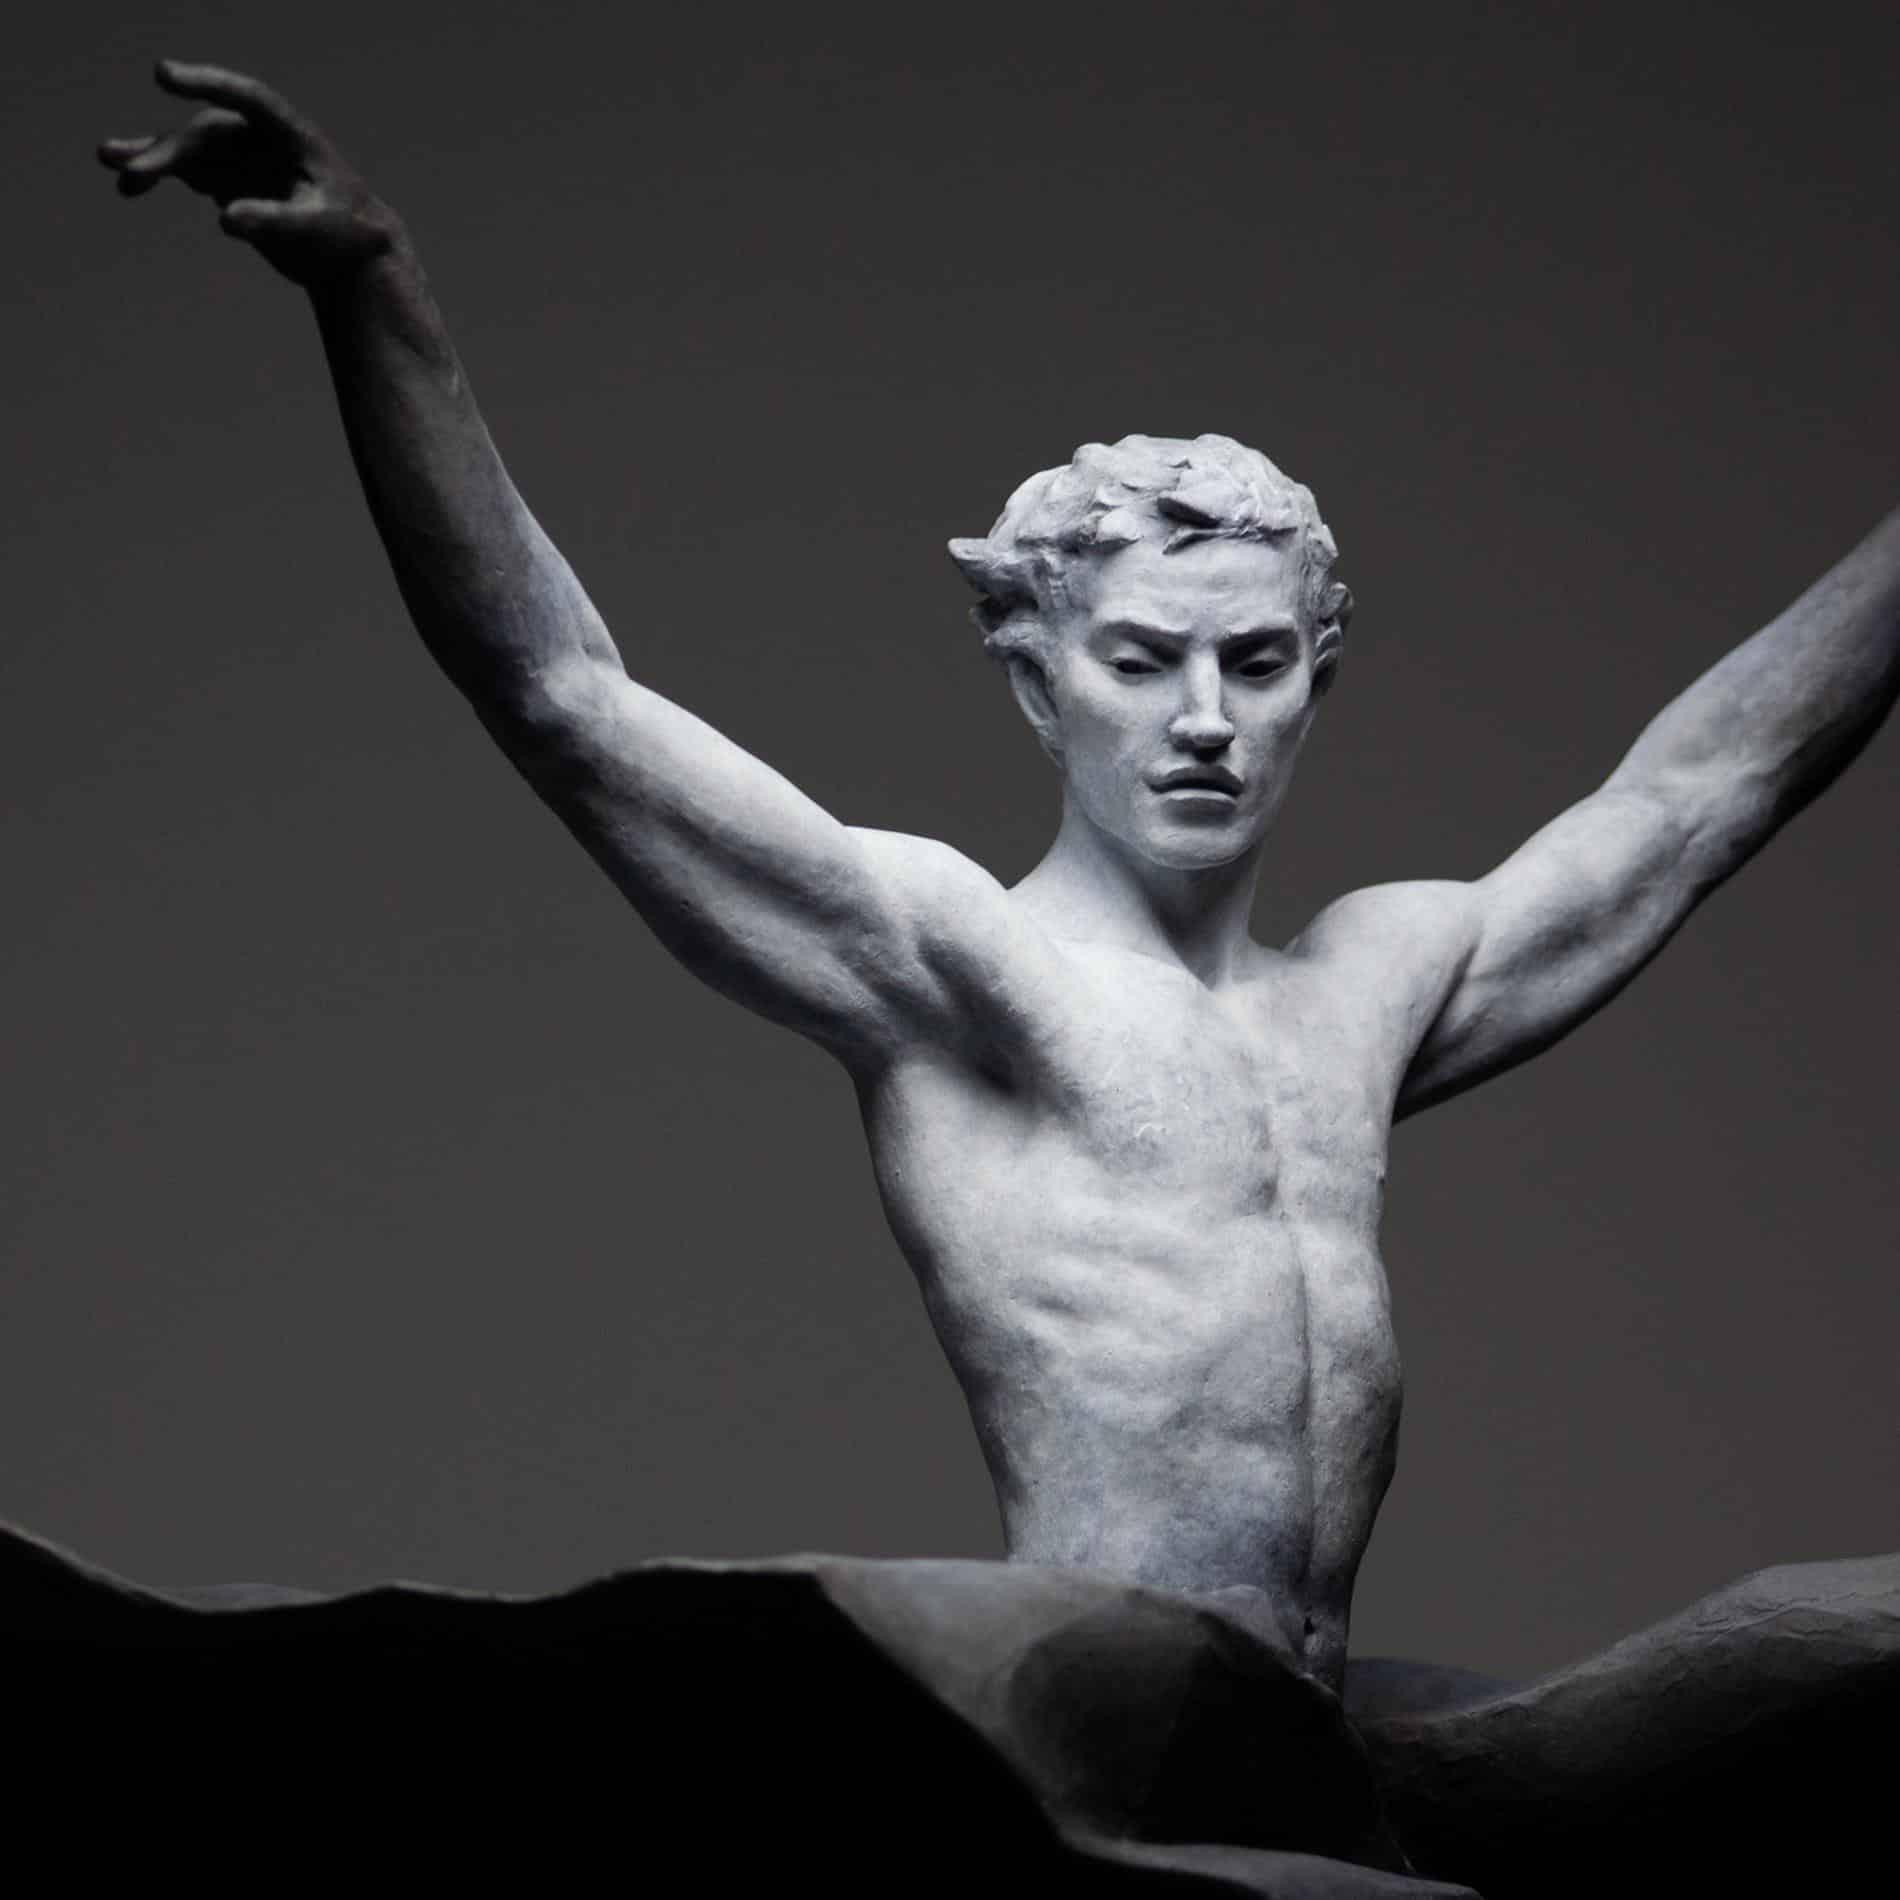 escultura coderechmalavia Moonlight Shadow detalle